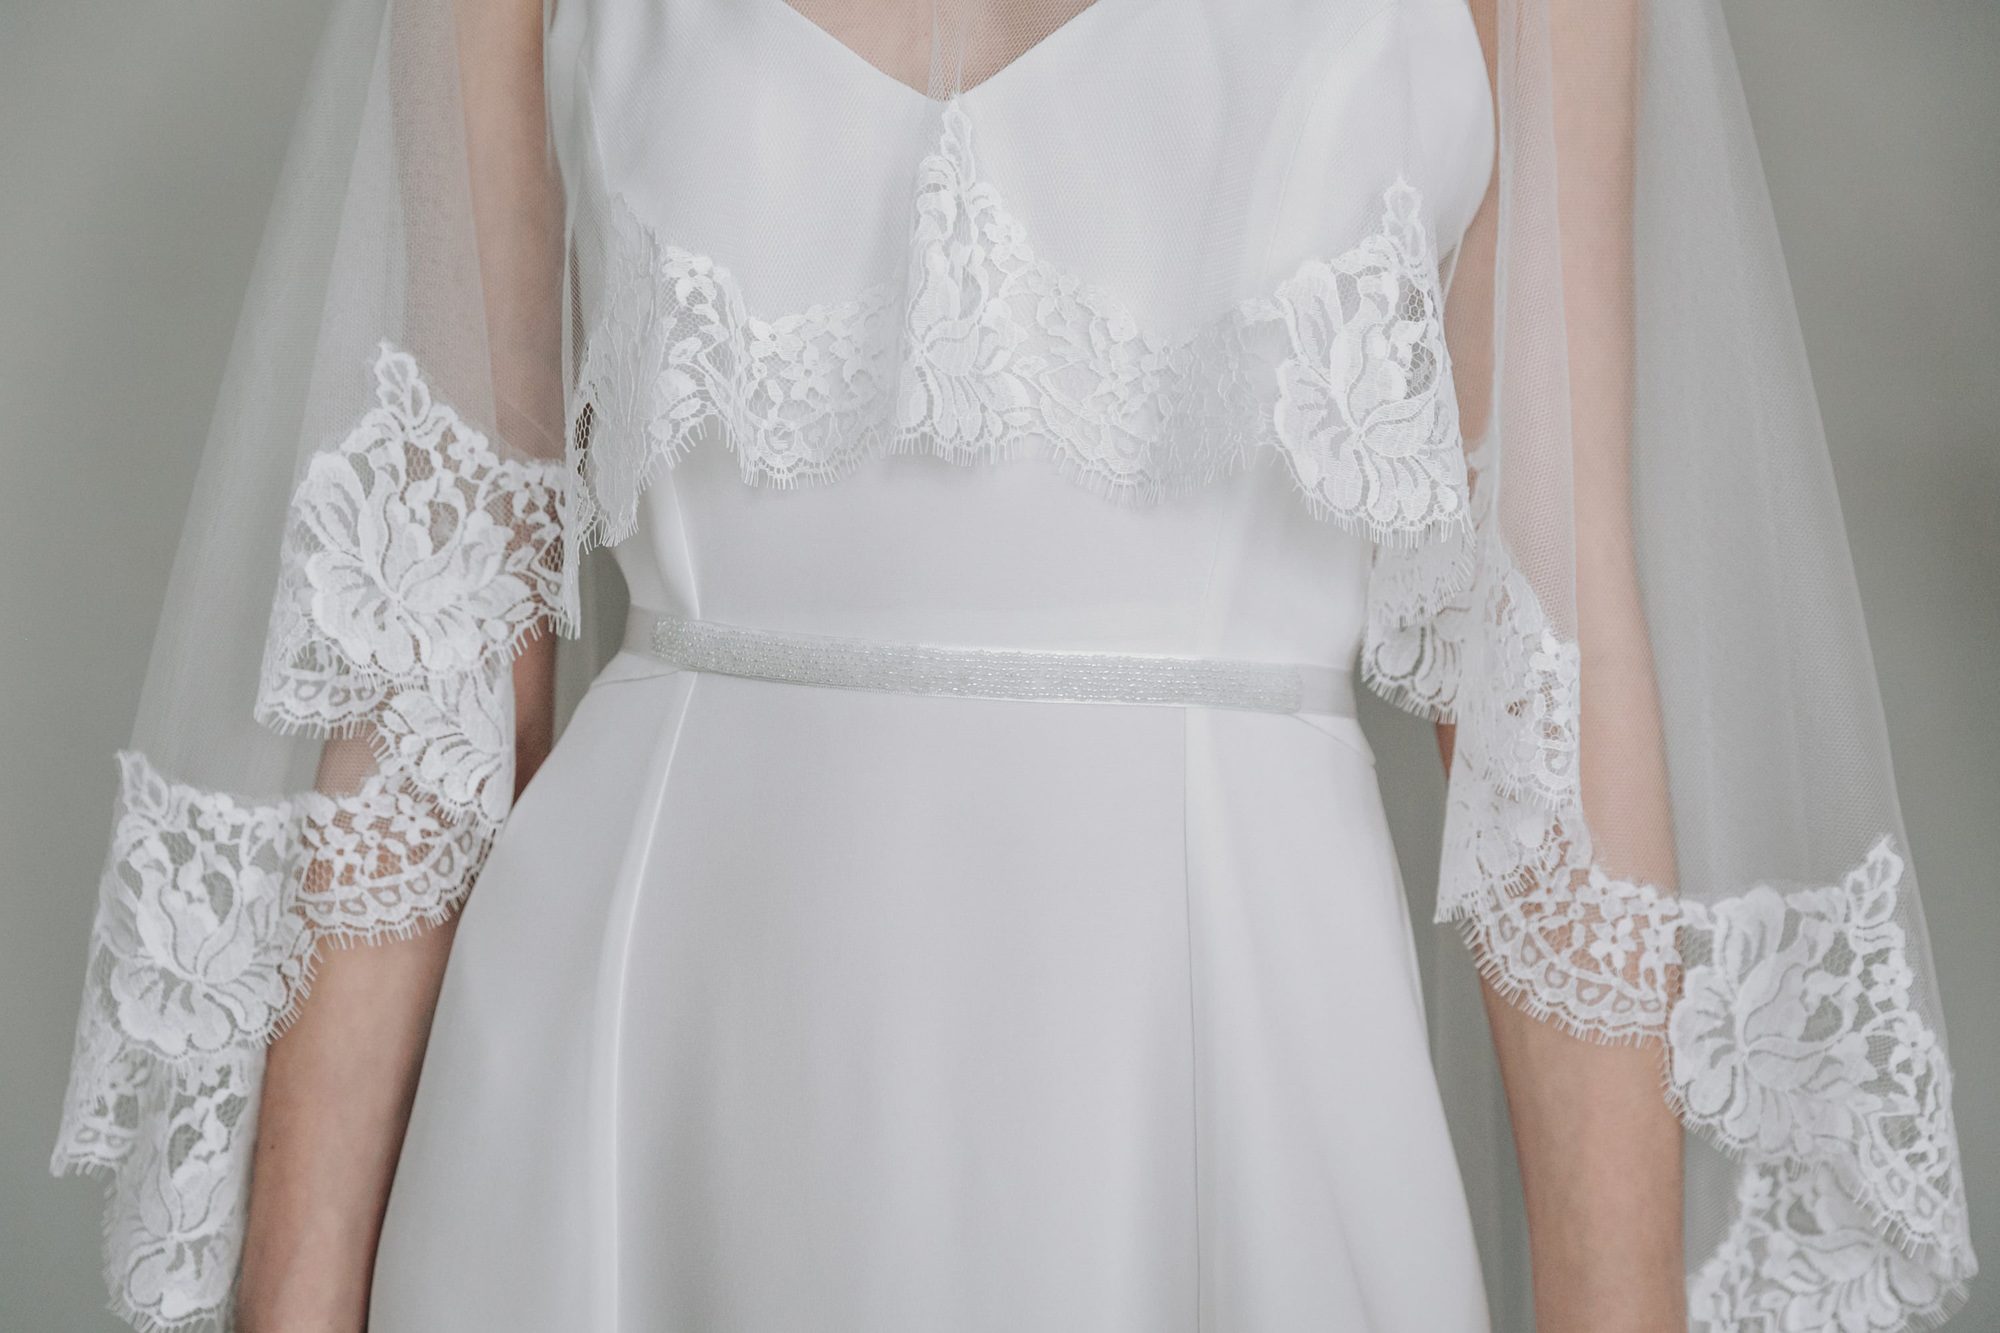 Kate-Beaumont-Sheffield-Rose-Lace-Hem-Bridal-Cape-Veil-9.jpg